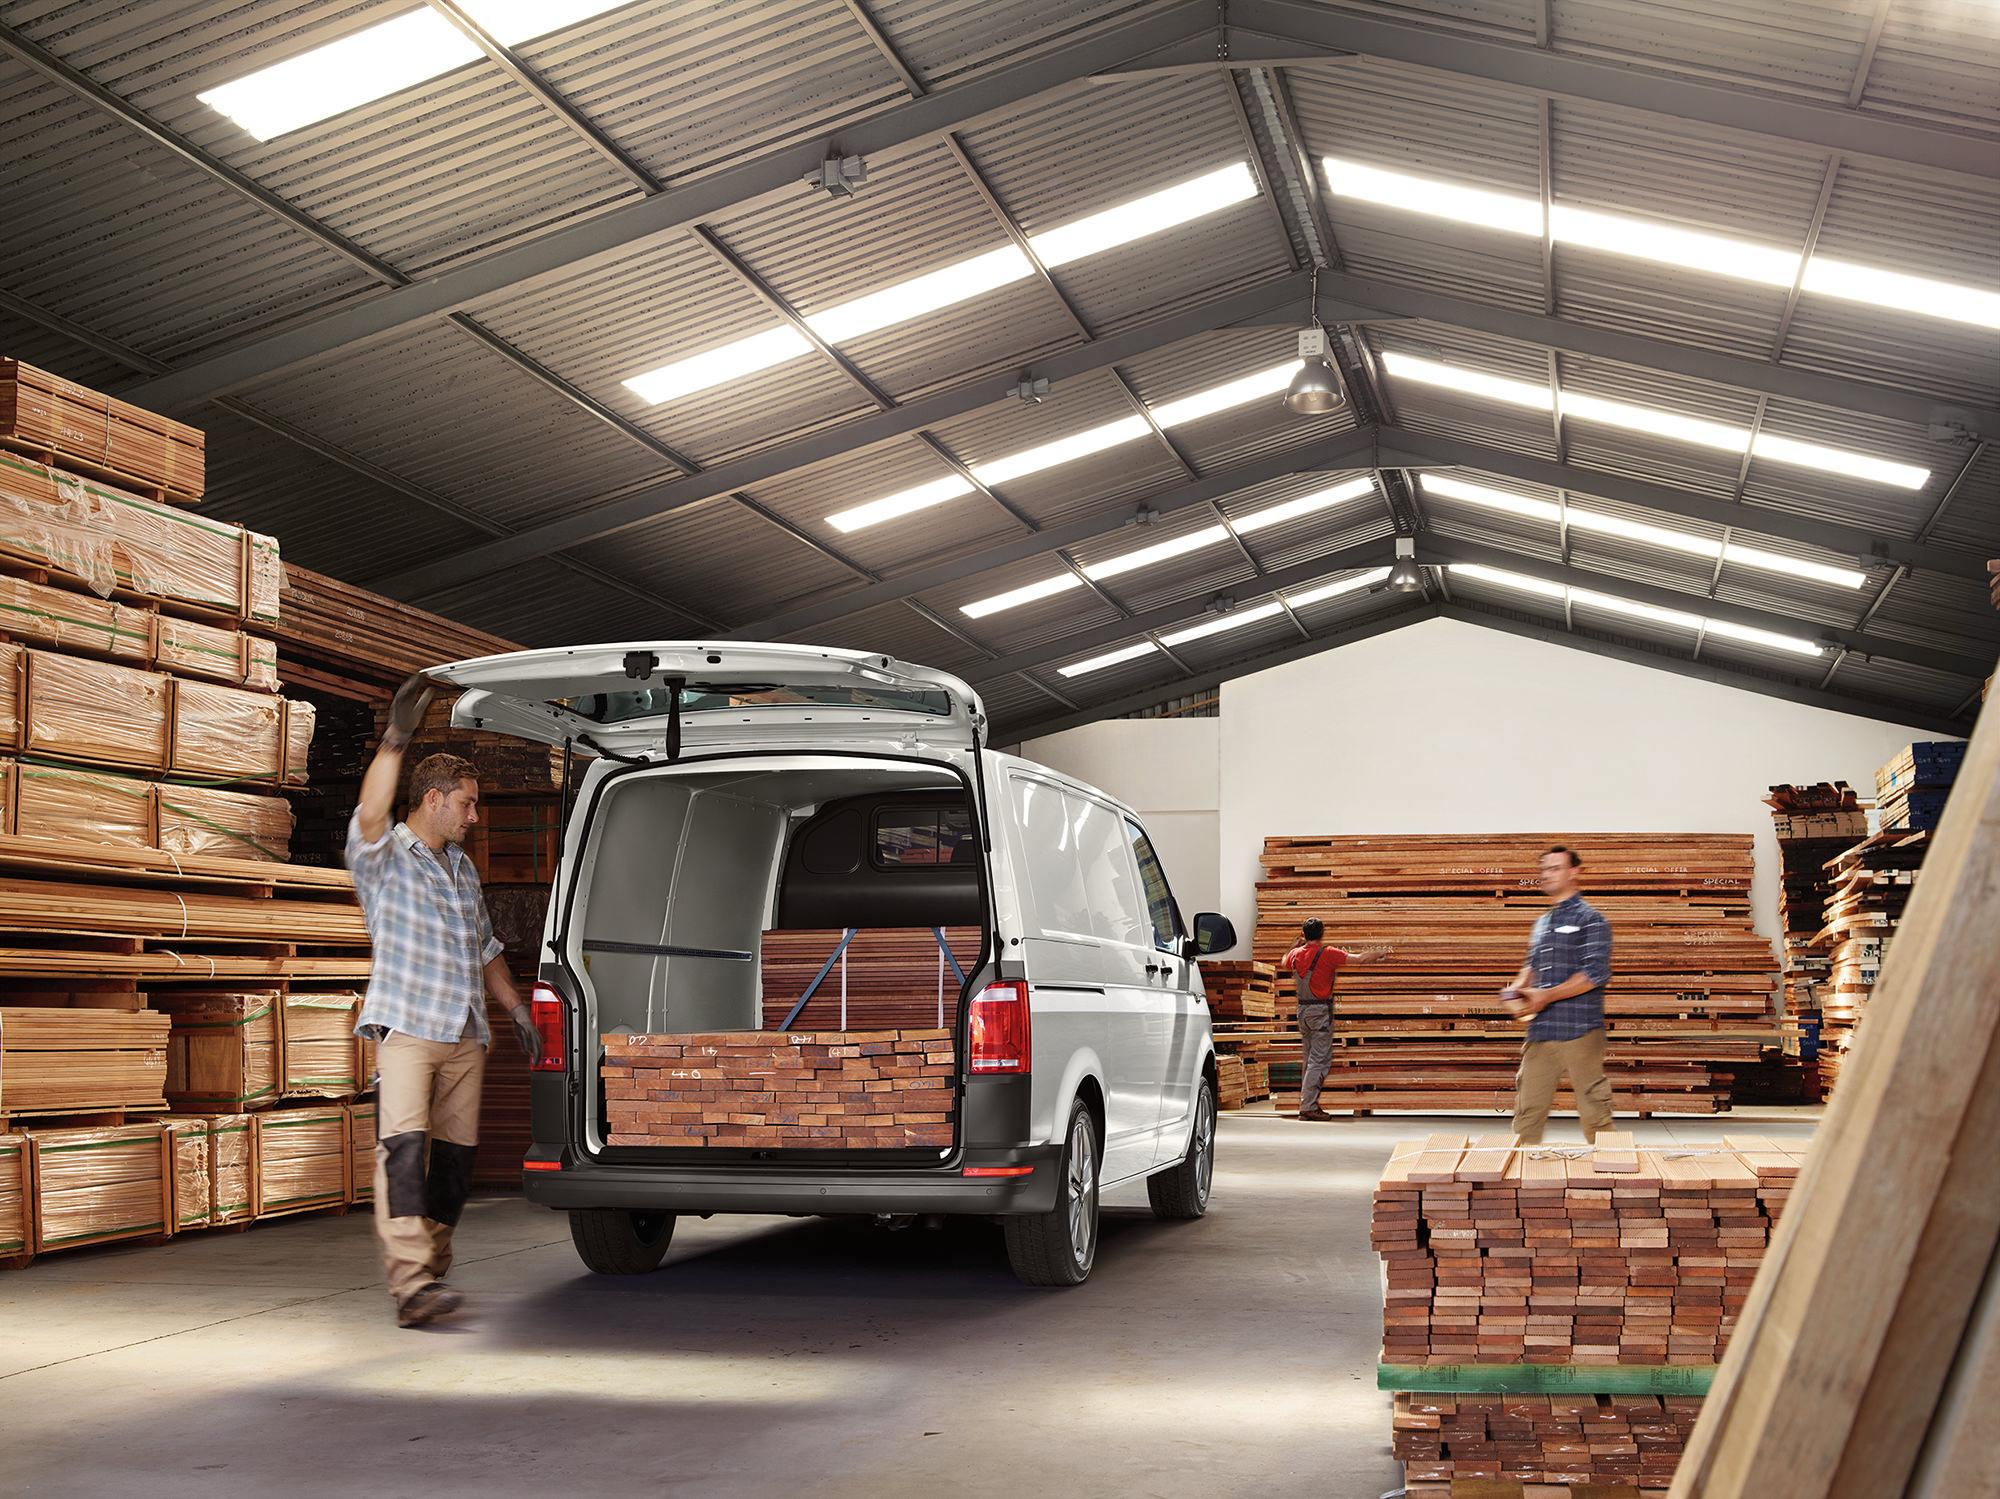 Puschmann VW Transporter